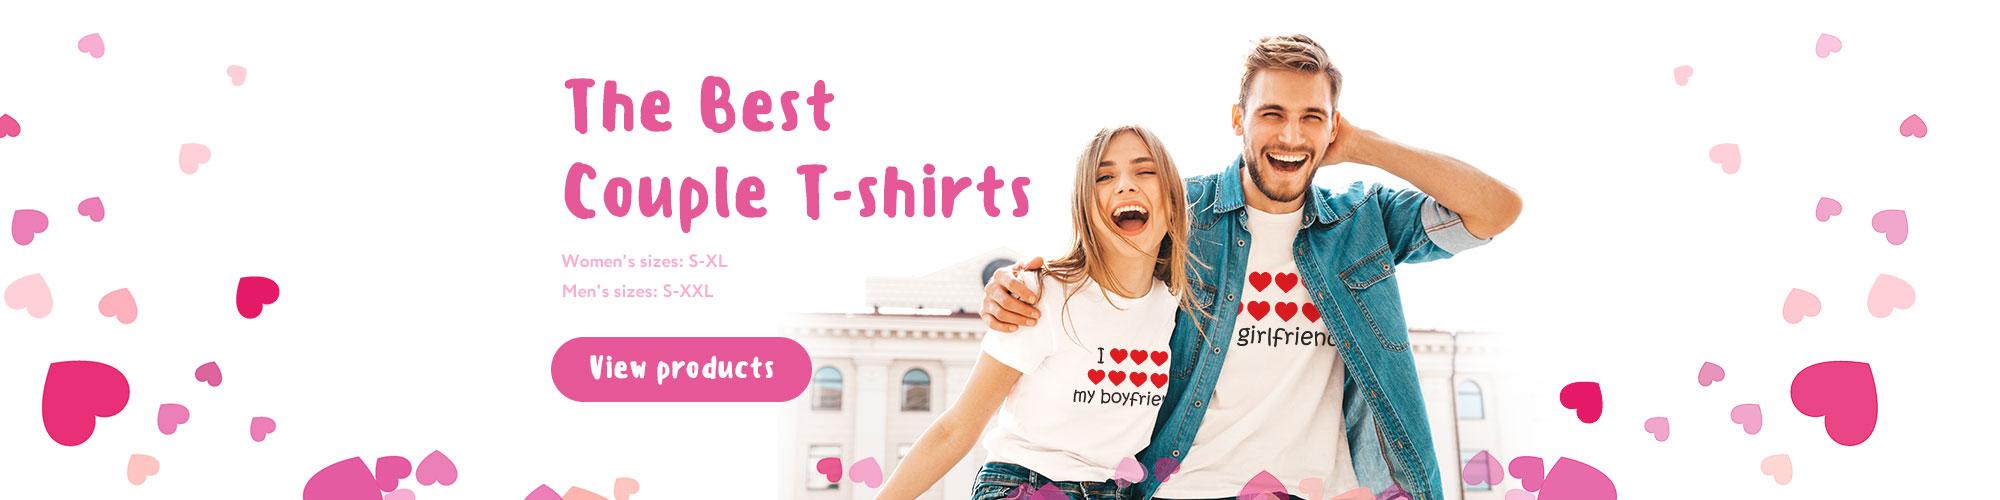 en-zestaw-koszulek